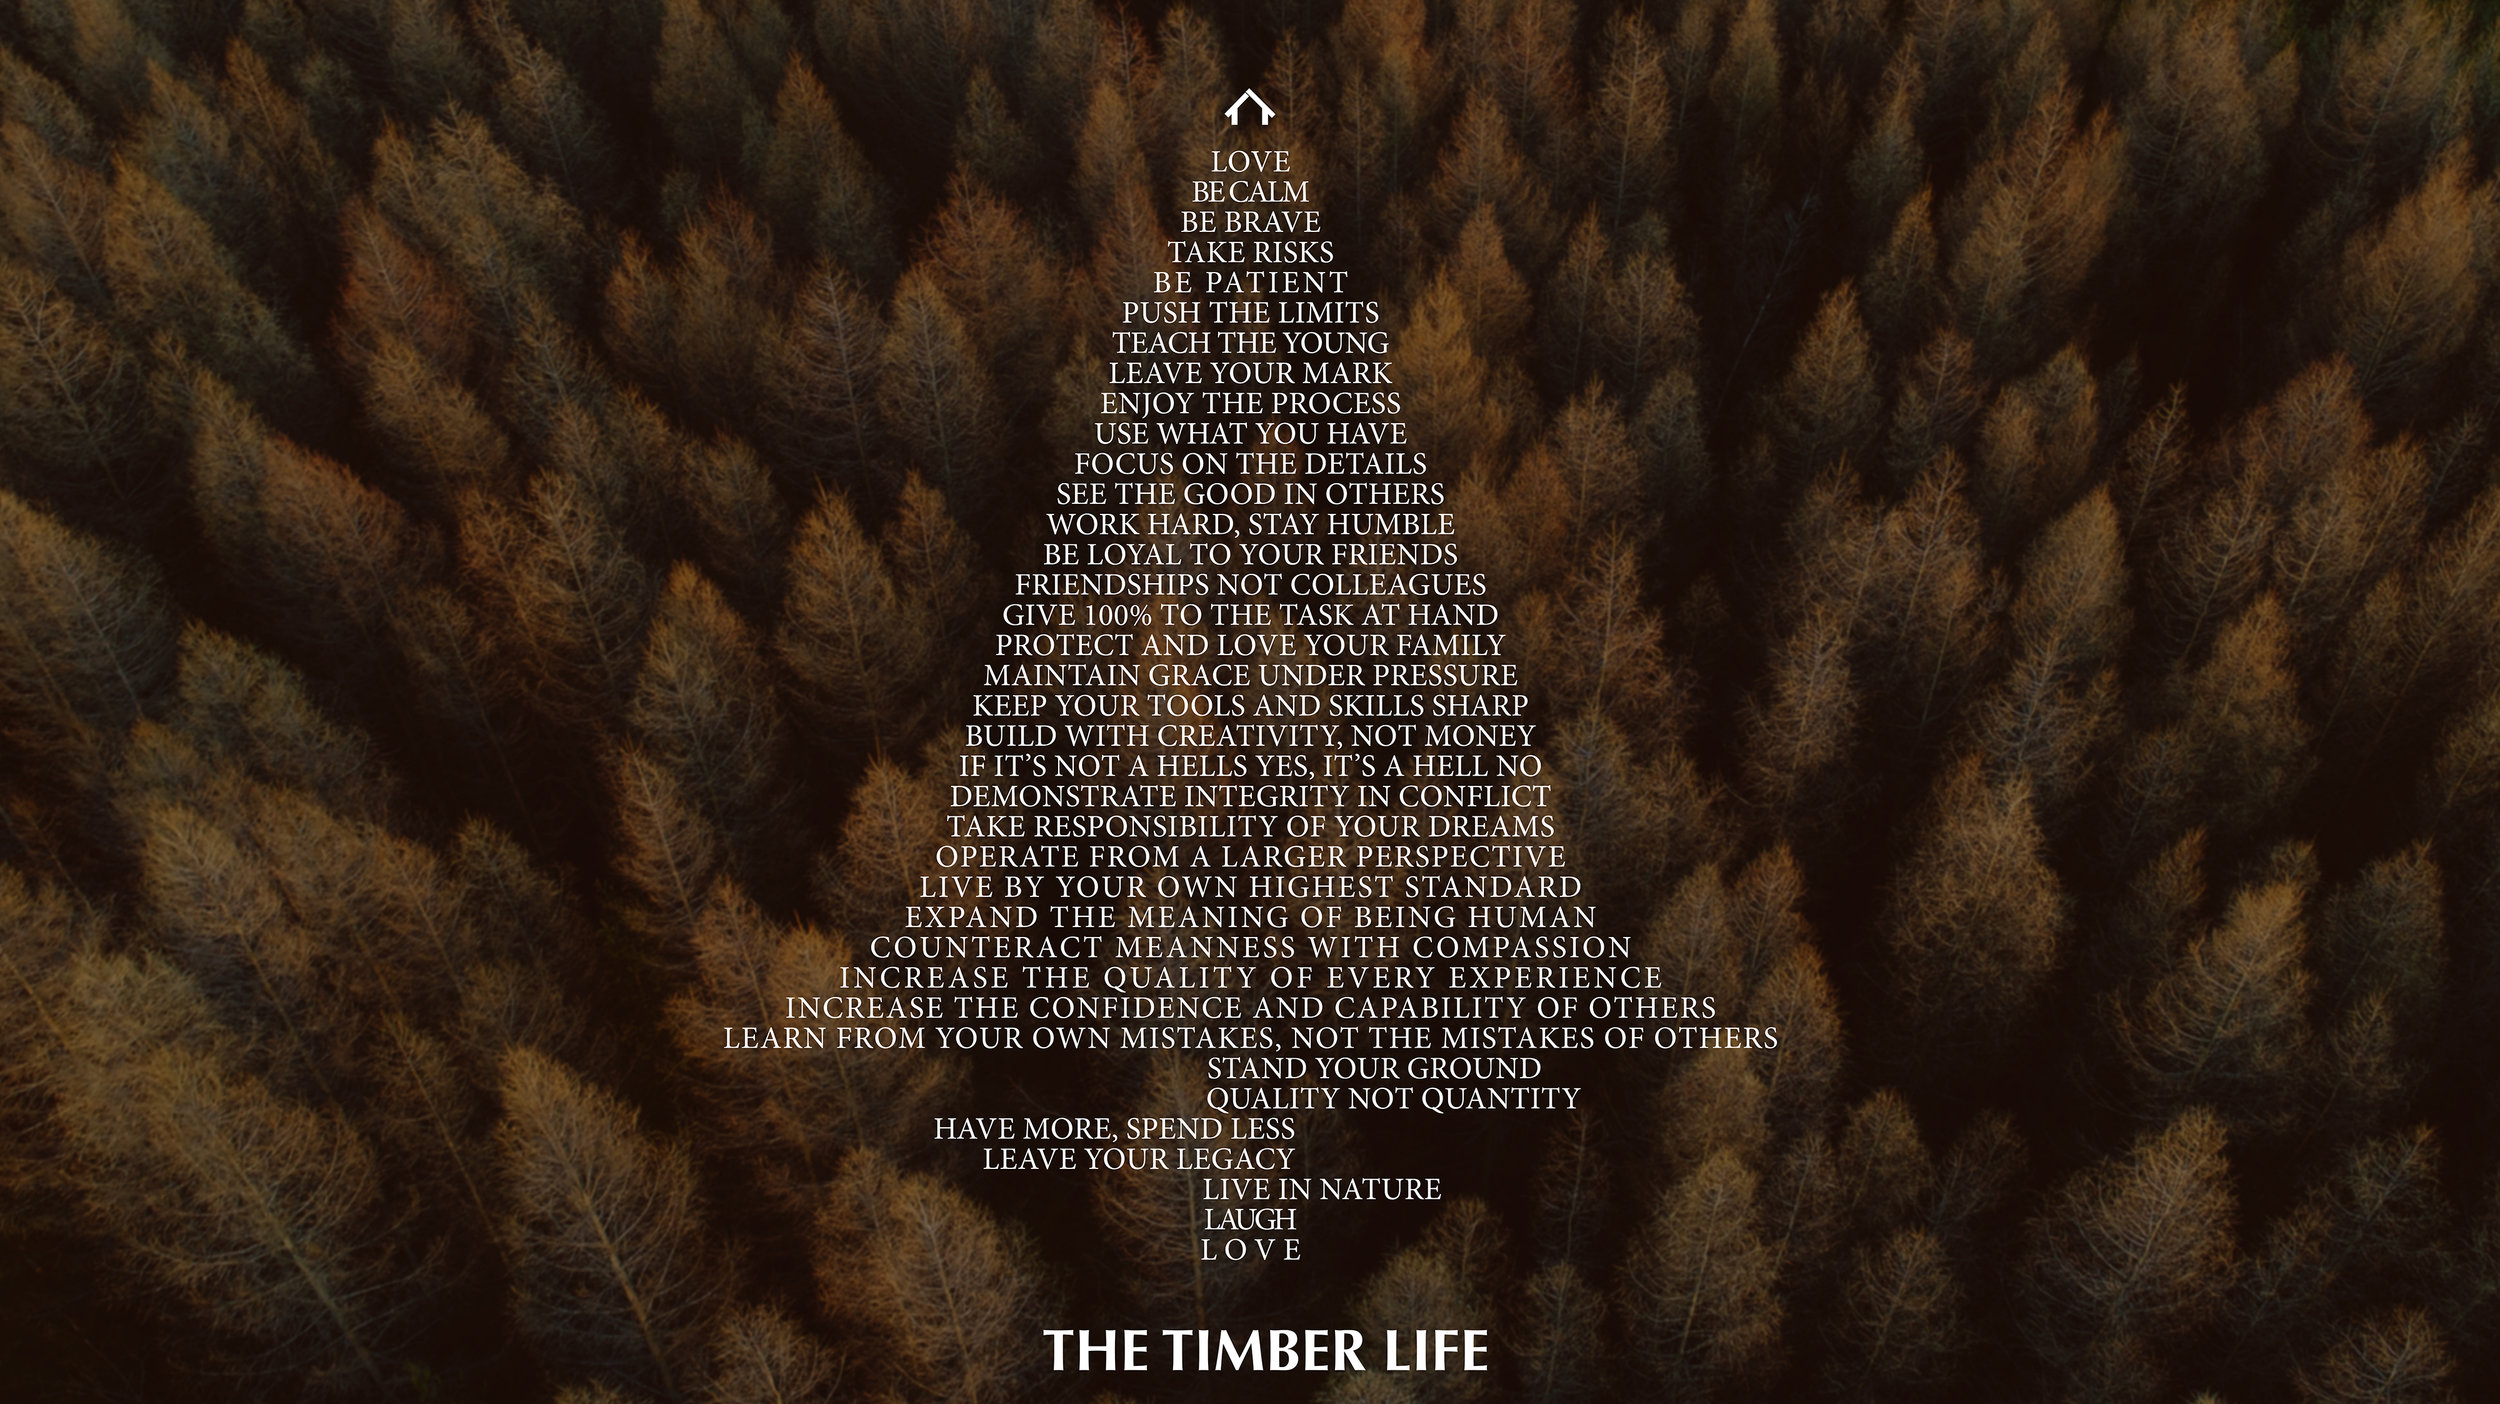 The Timber Life